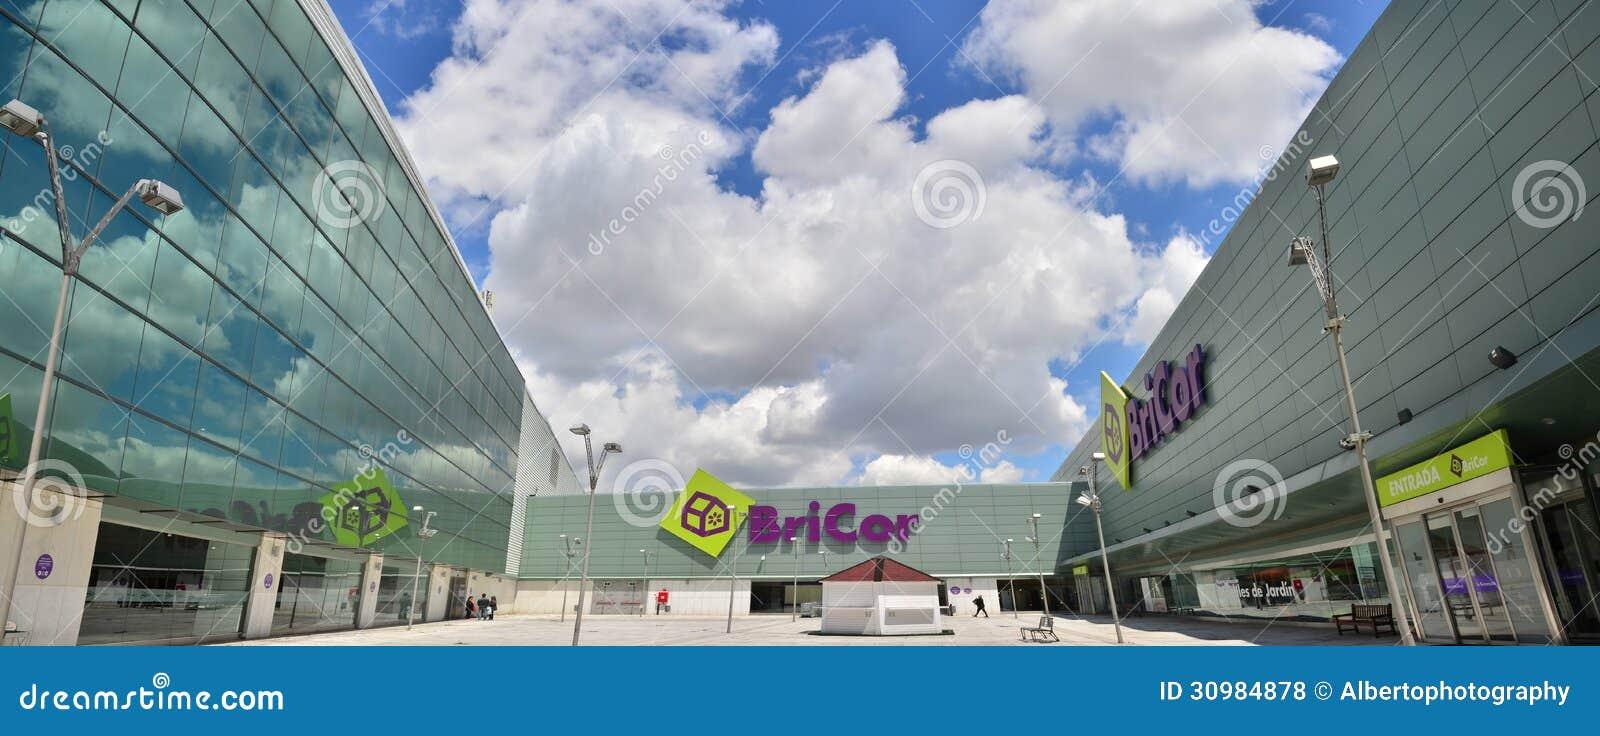 Bricor store editorial stock photo image 30984878 - Bricor madrid ...